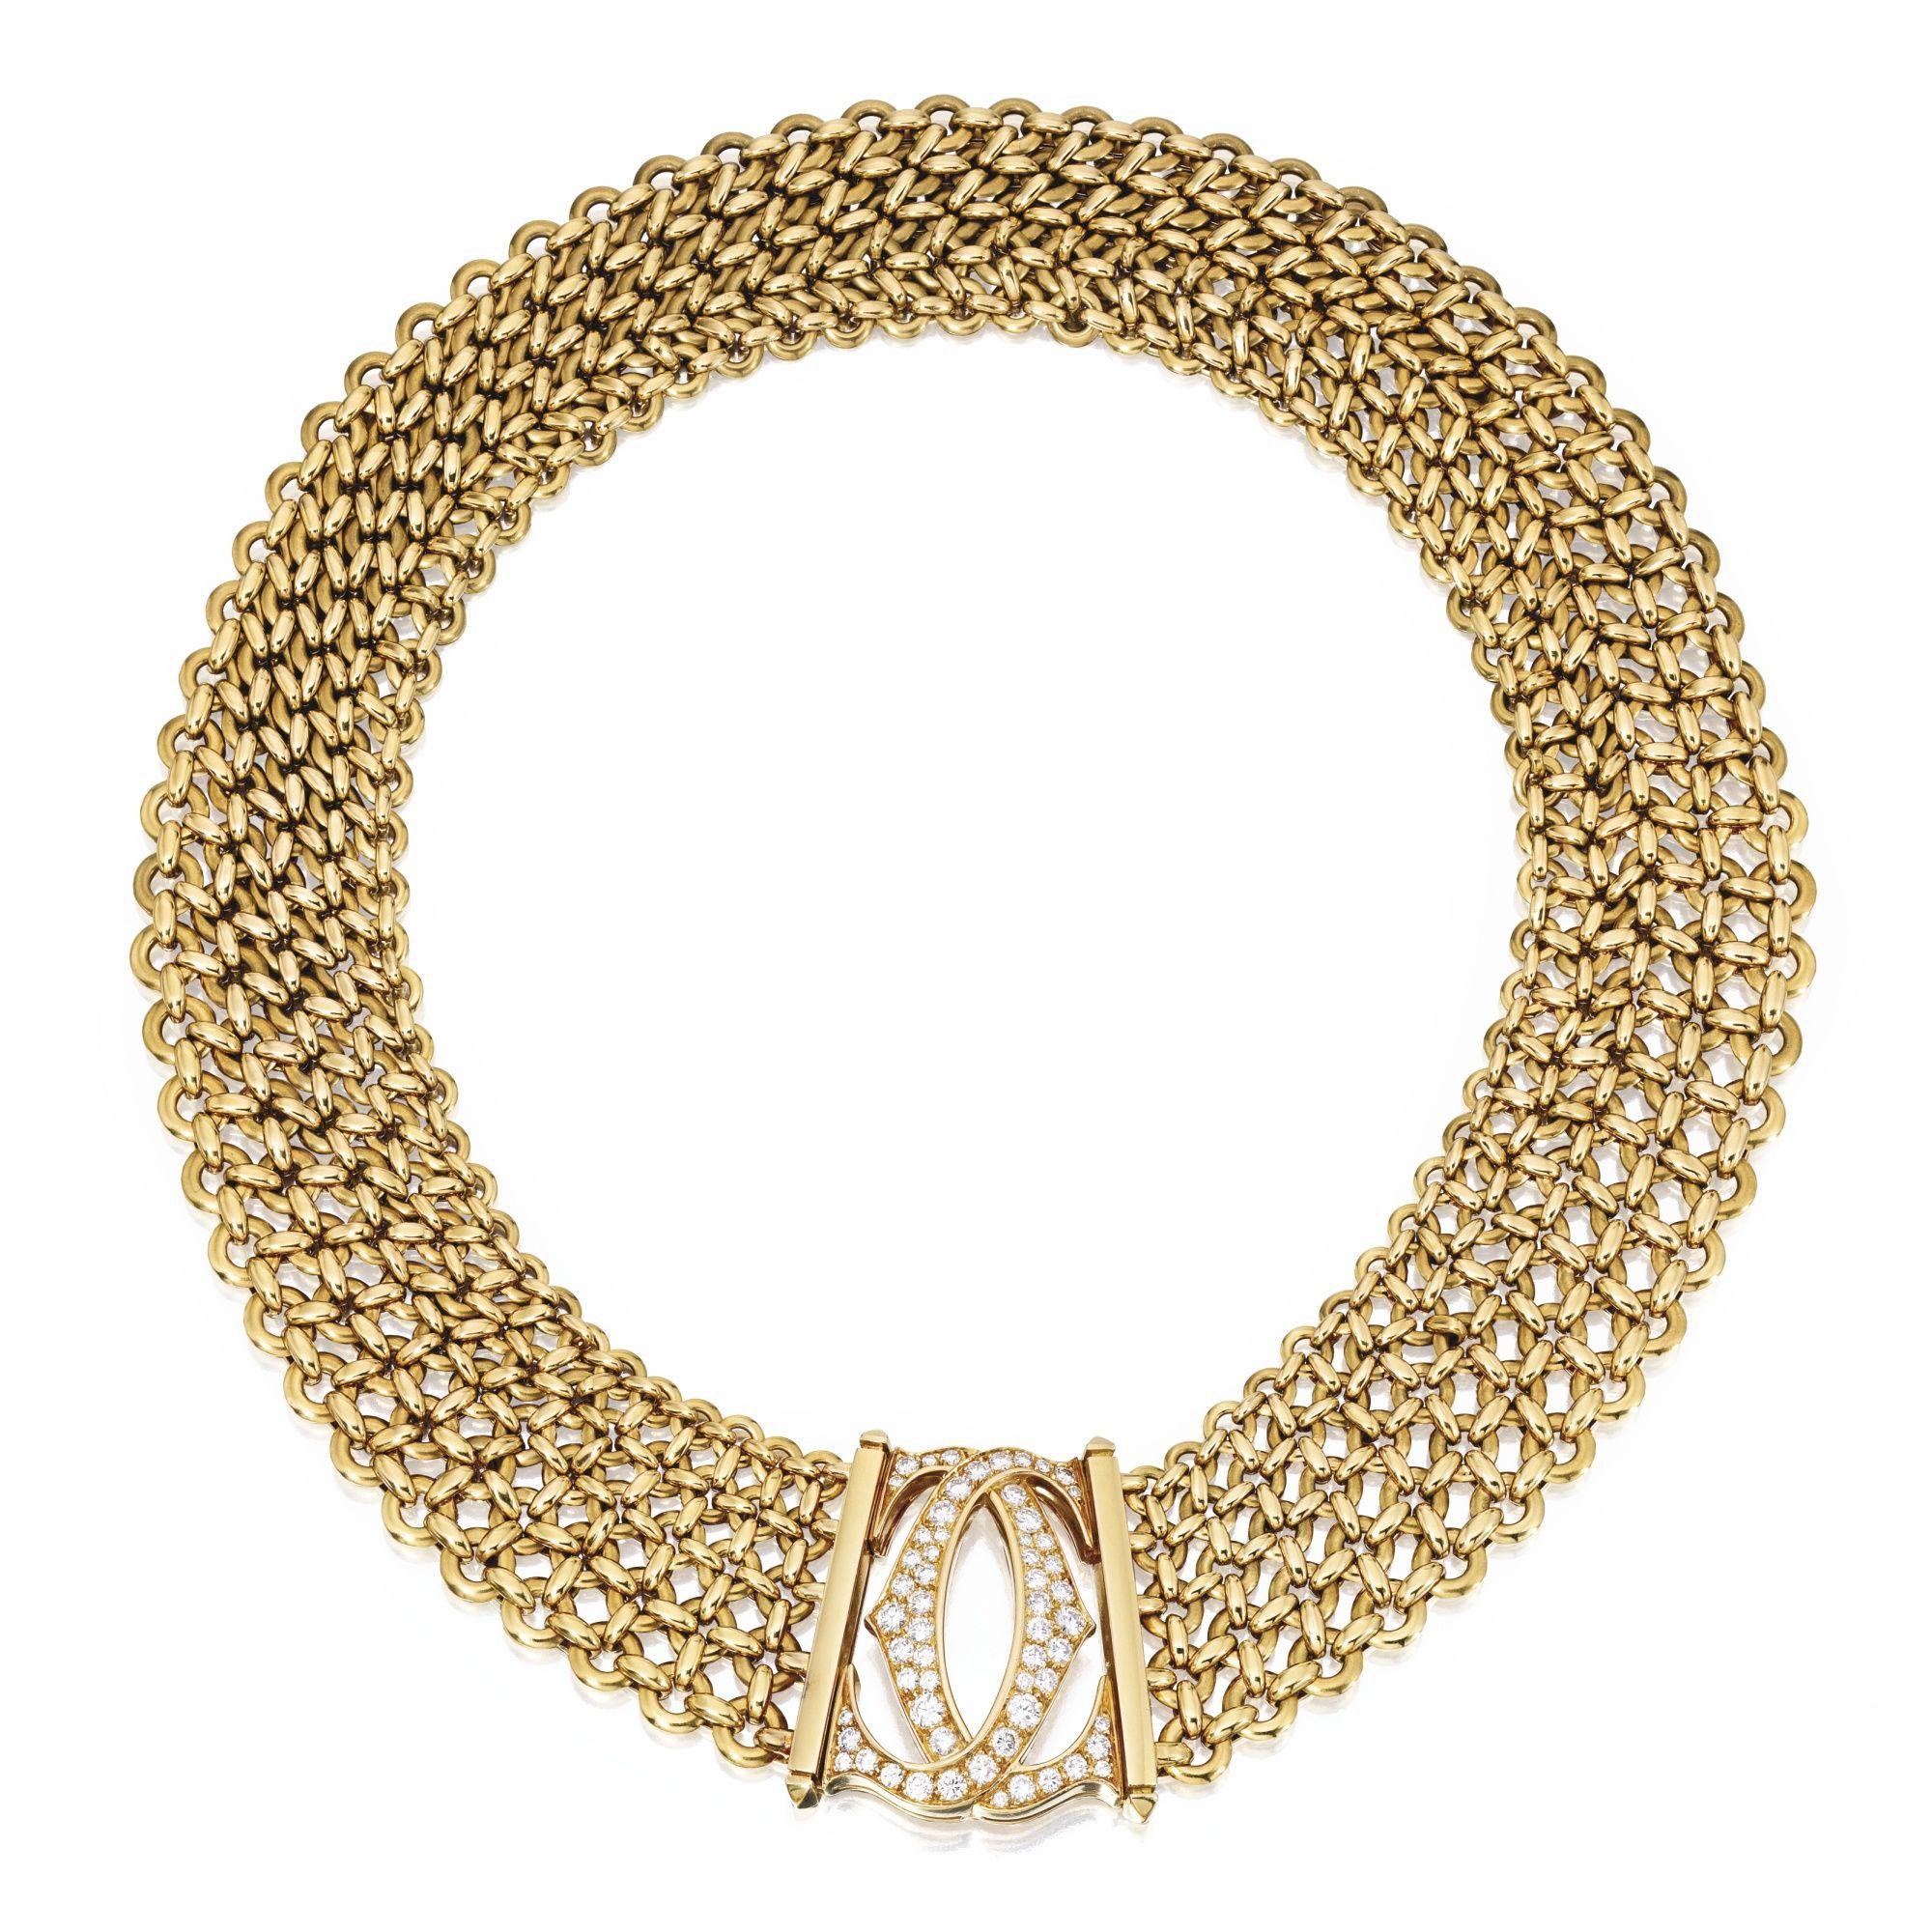 karat gold and diamond necklace cartier france the flexible